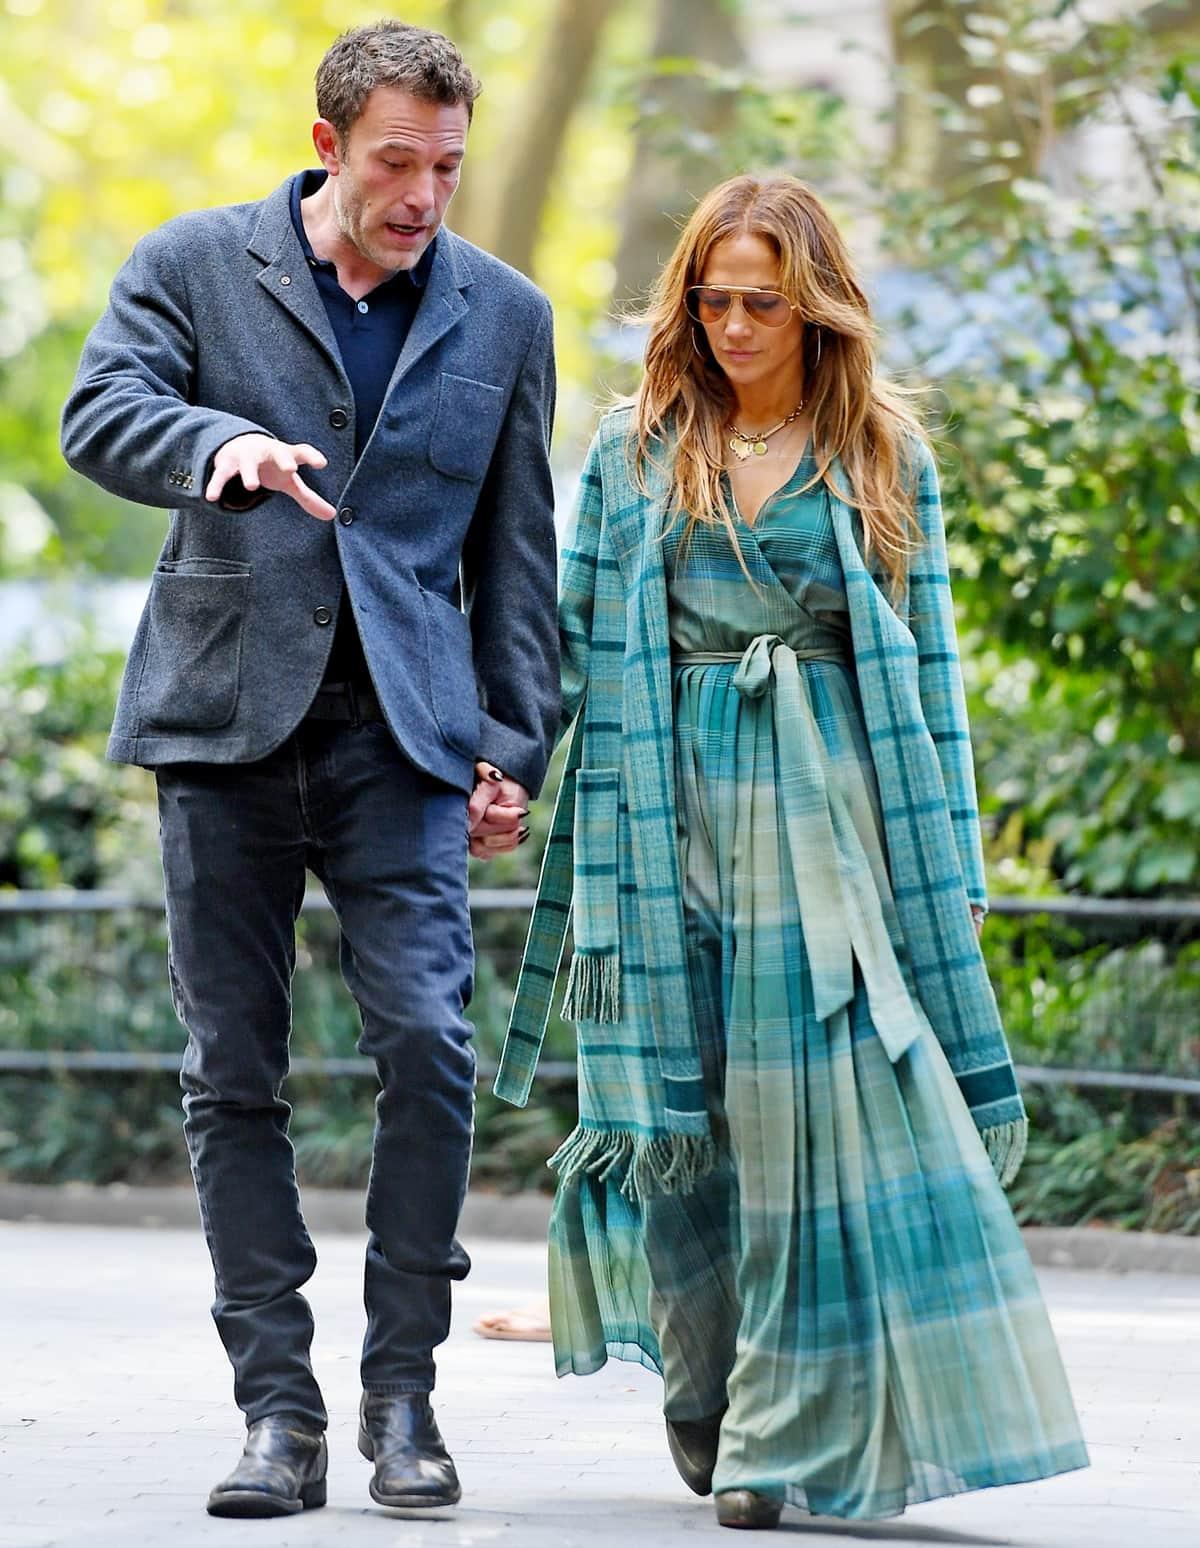 Jennifer Lopez and Ben Affleck sightseeing together in Madison Square Park